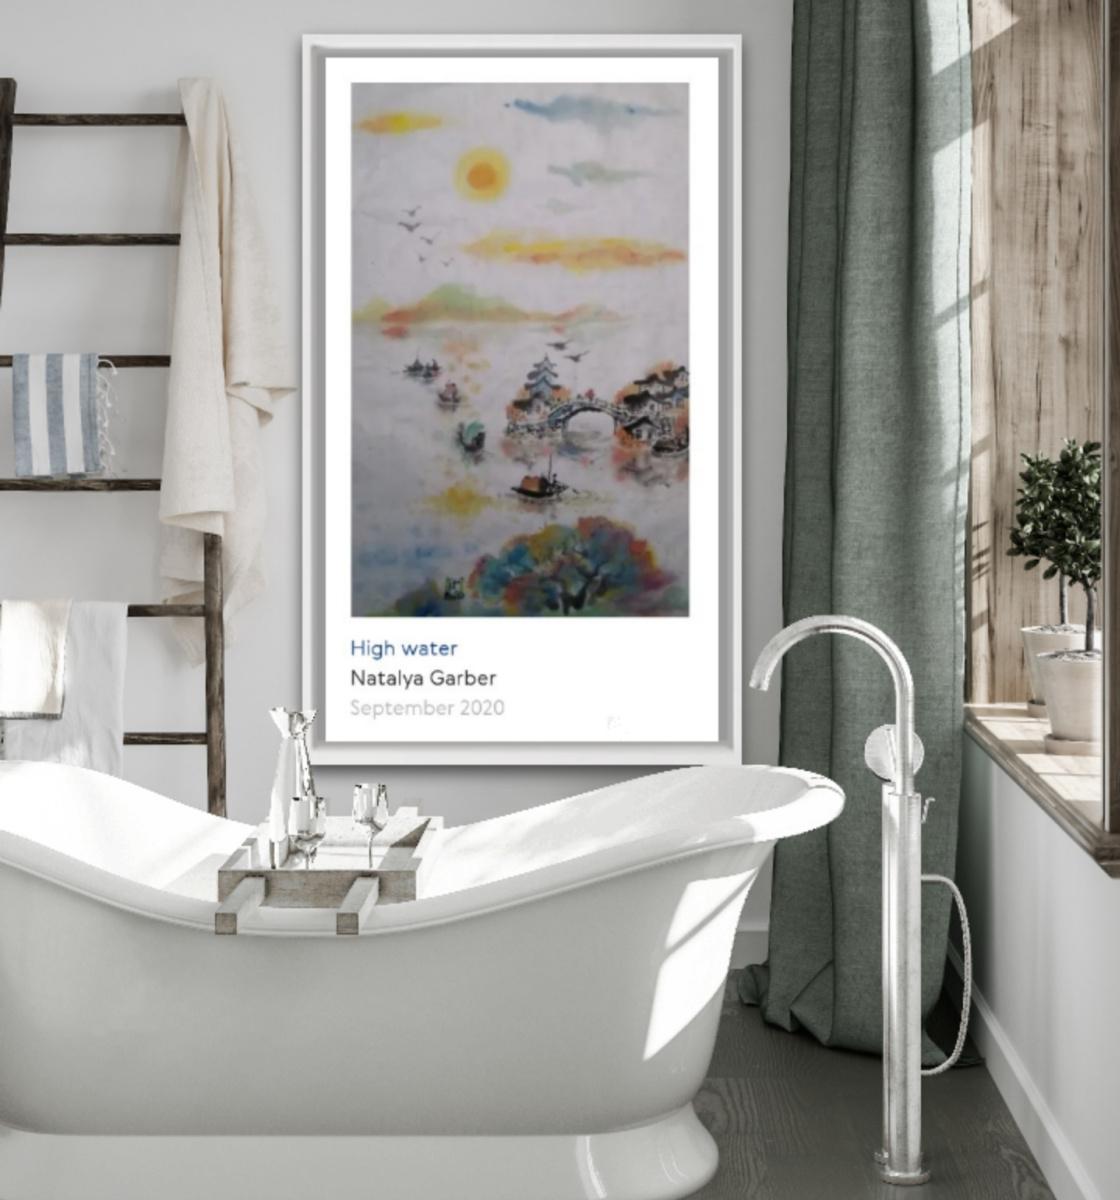 Natalya Garber. Big water. A relaxing bath masterpiece